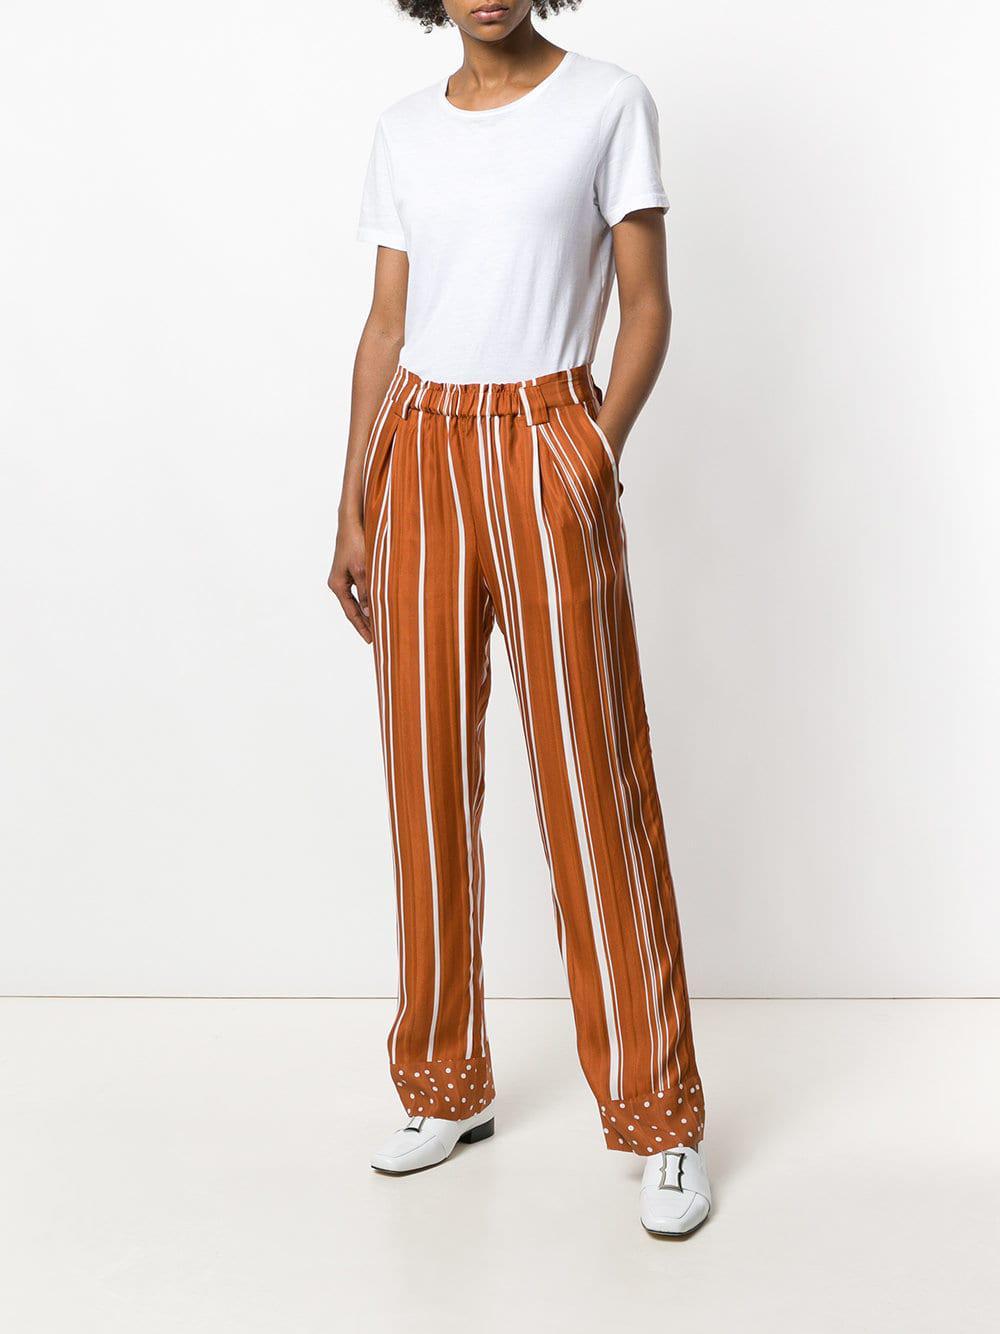 de puntos pantalones impresión Goya Lyst y naranja Stine rayas pwxXzvfq